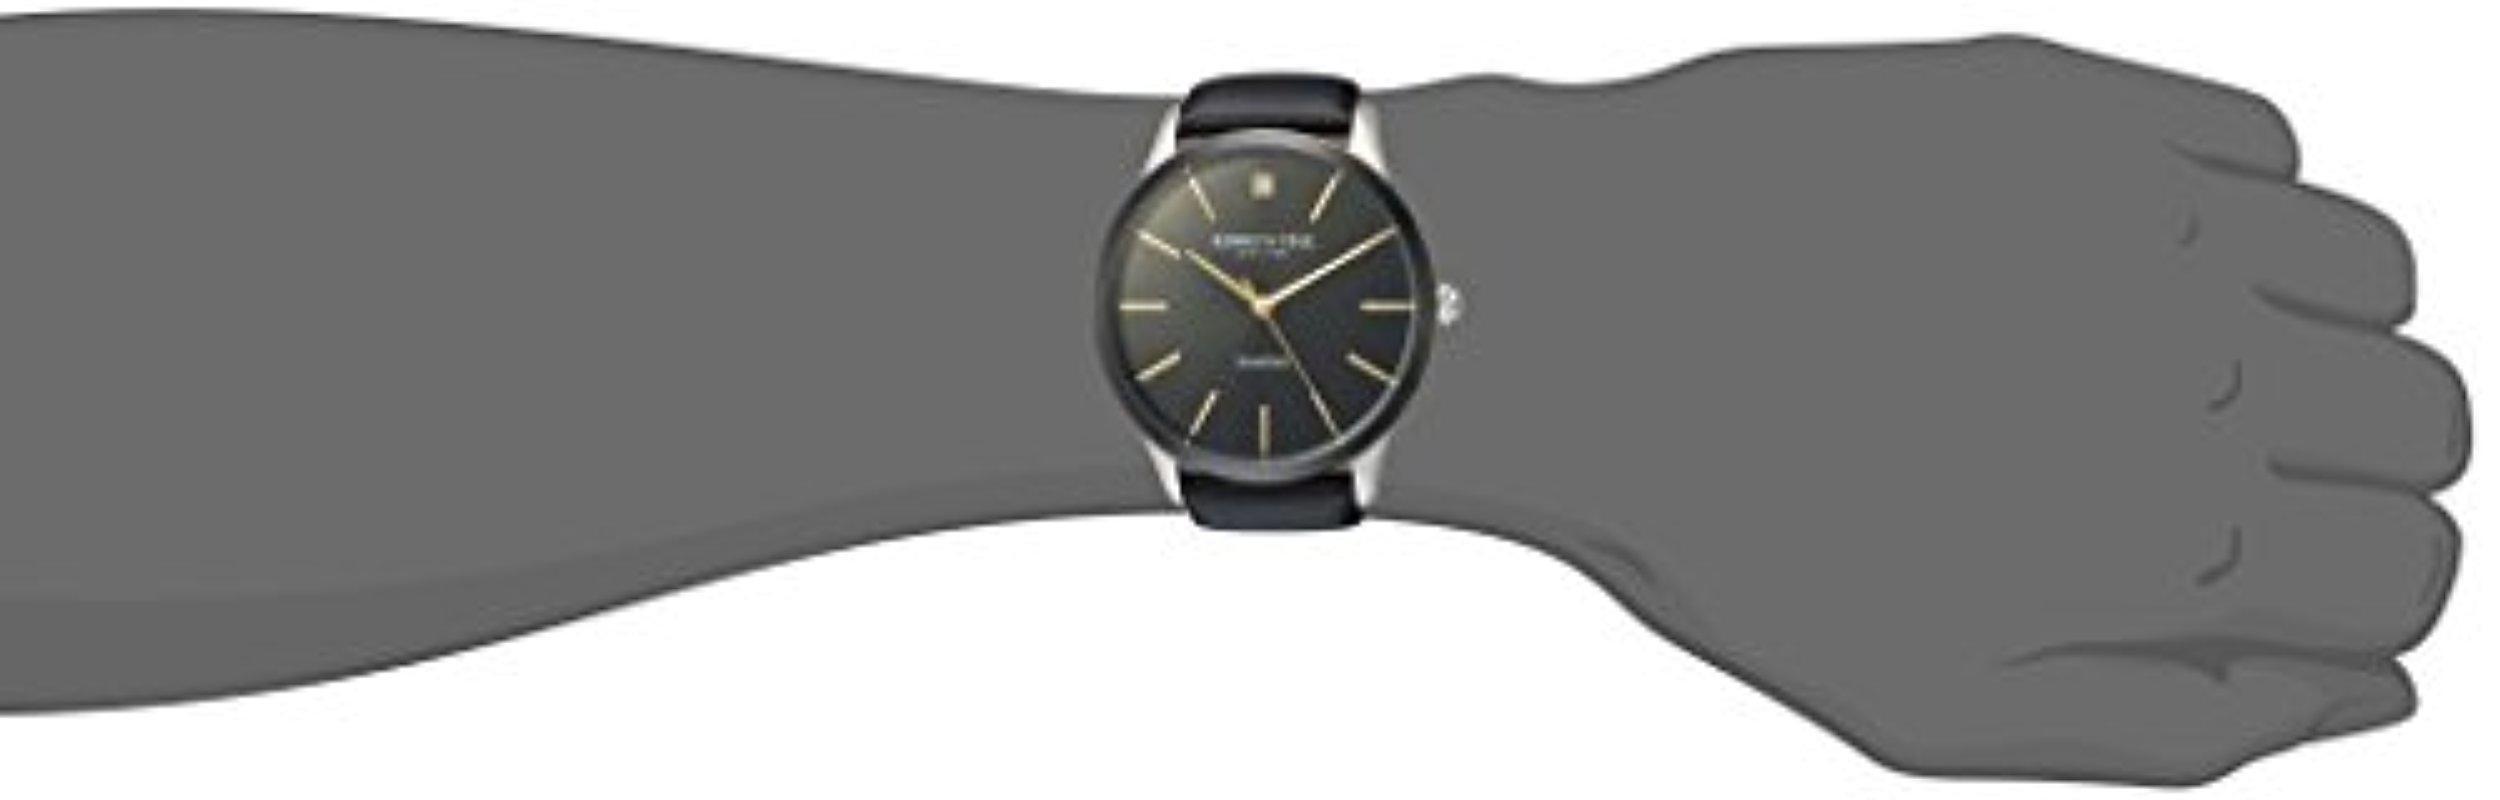 Steel Men Stainless blackmodelKc15111003For Leather Cole Quartz 'diamond' Kenneth Dress And WatchColor ZXOkuiTP